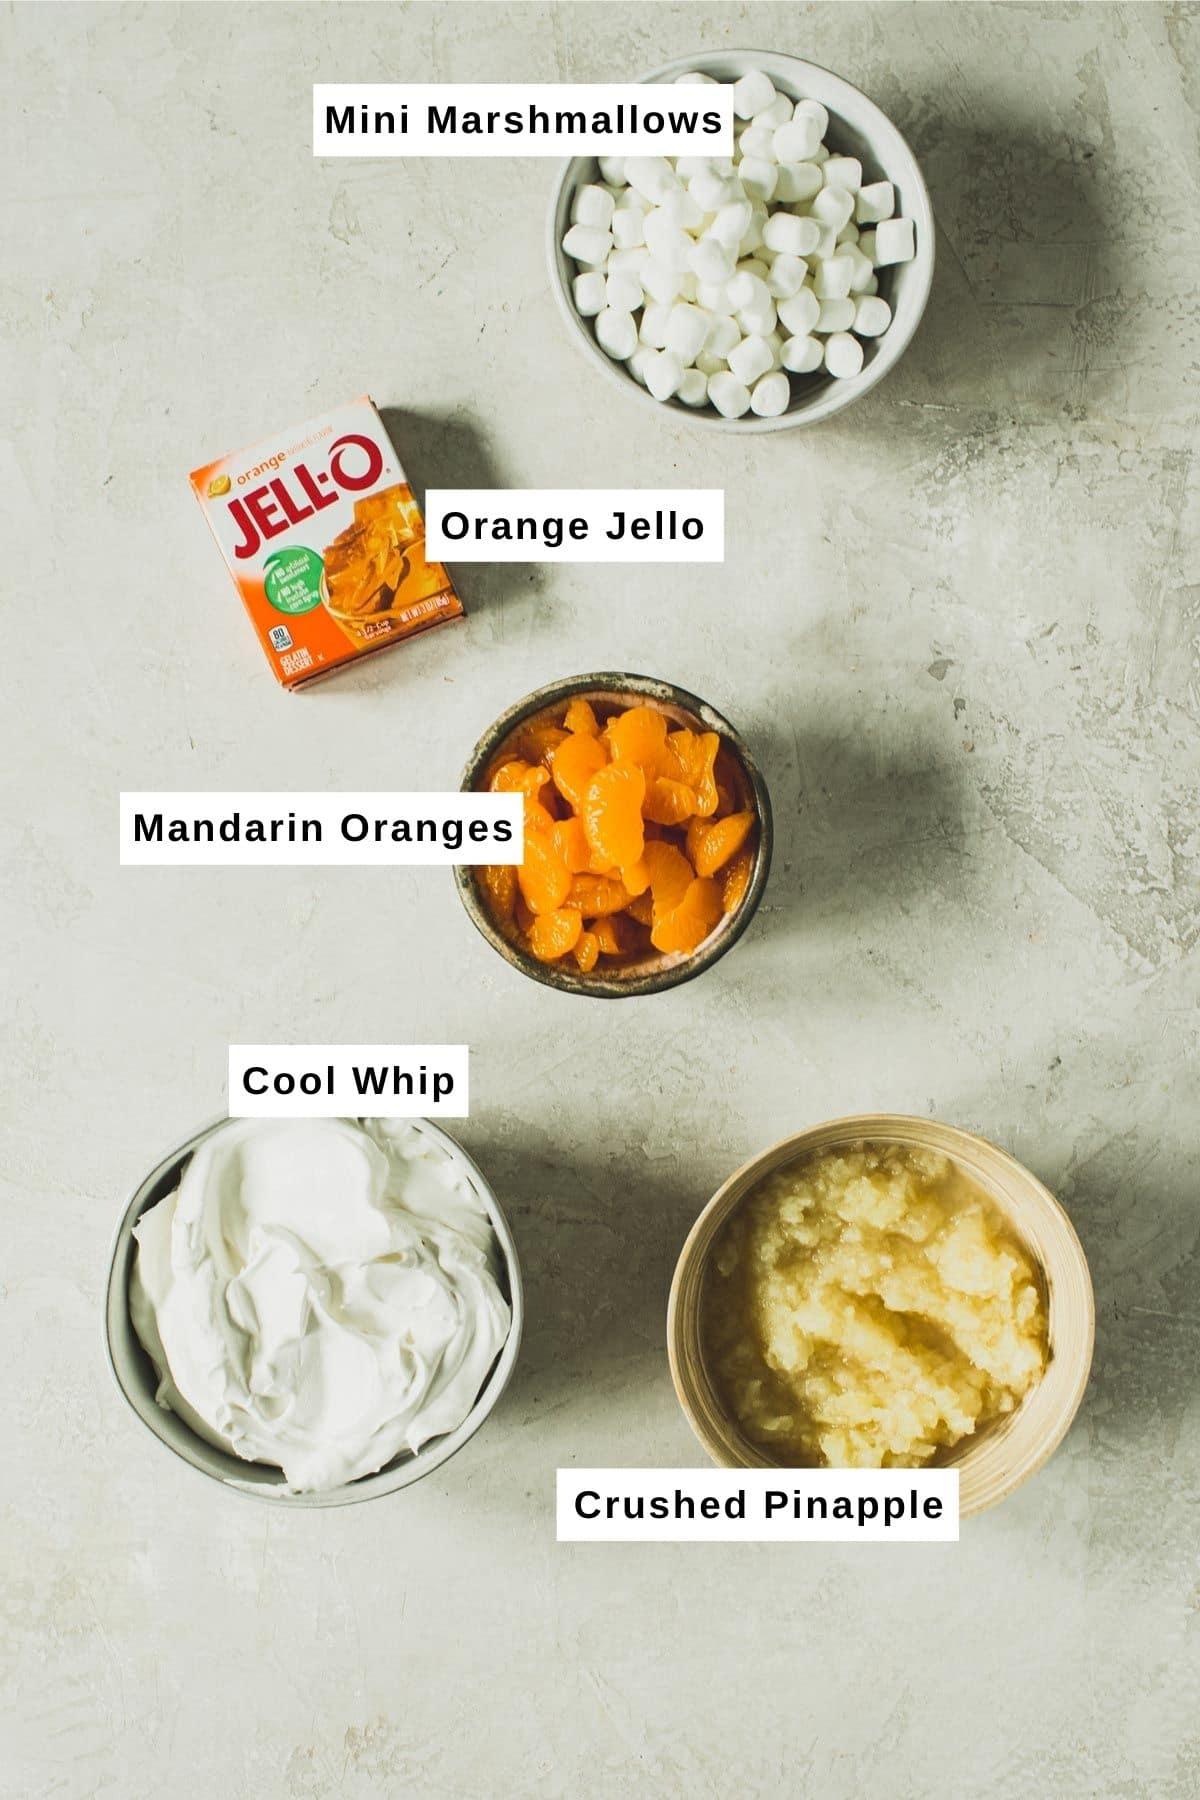 Orange Jello salad ingredients in bowls.